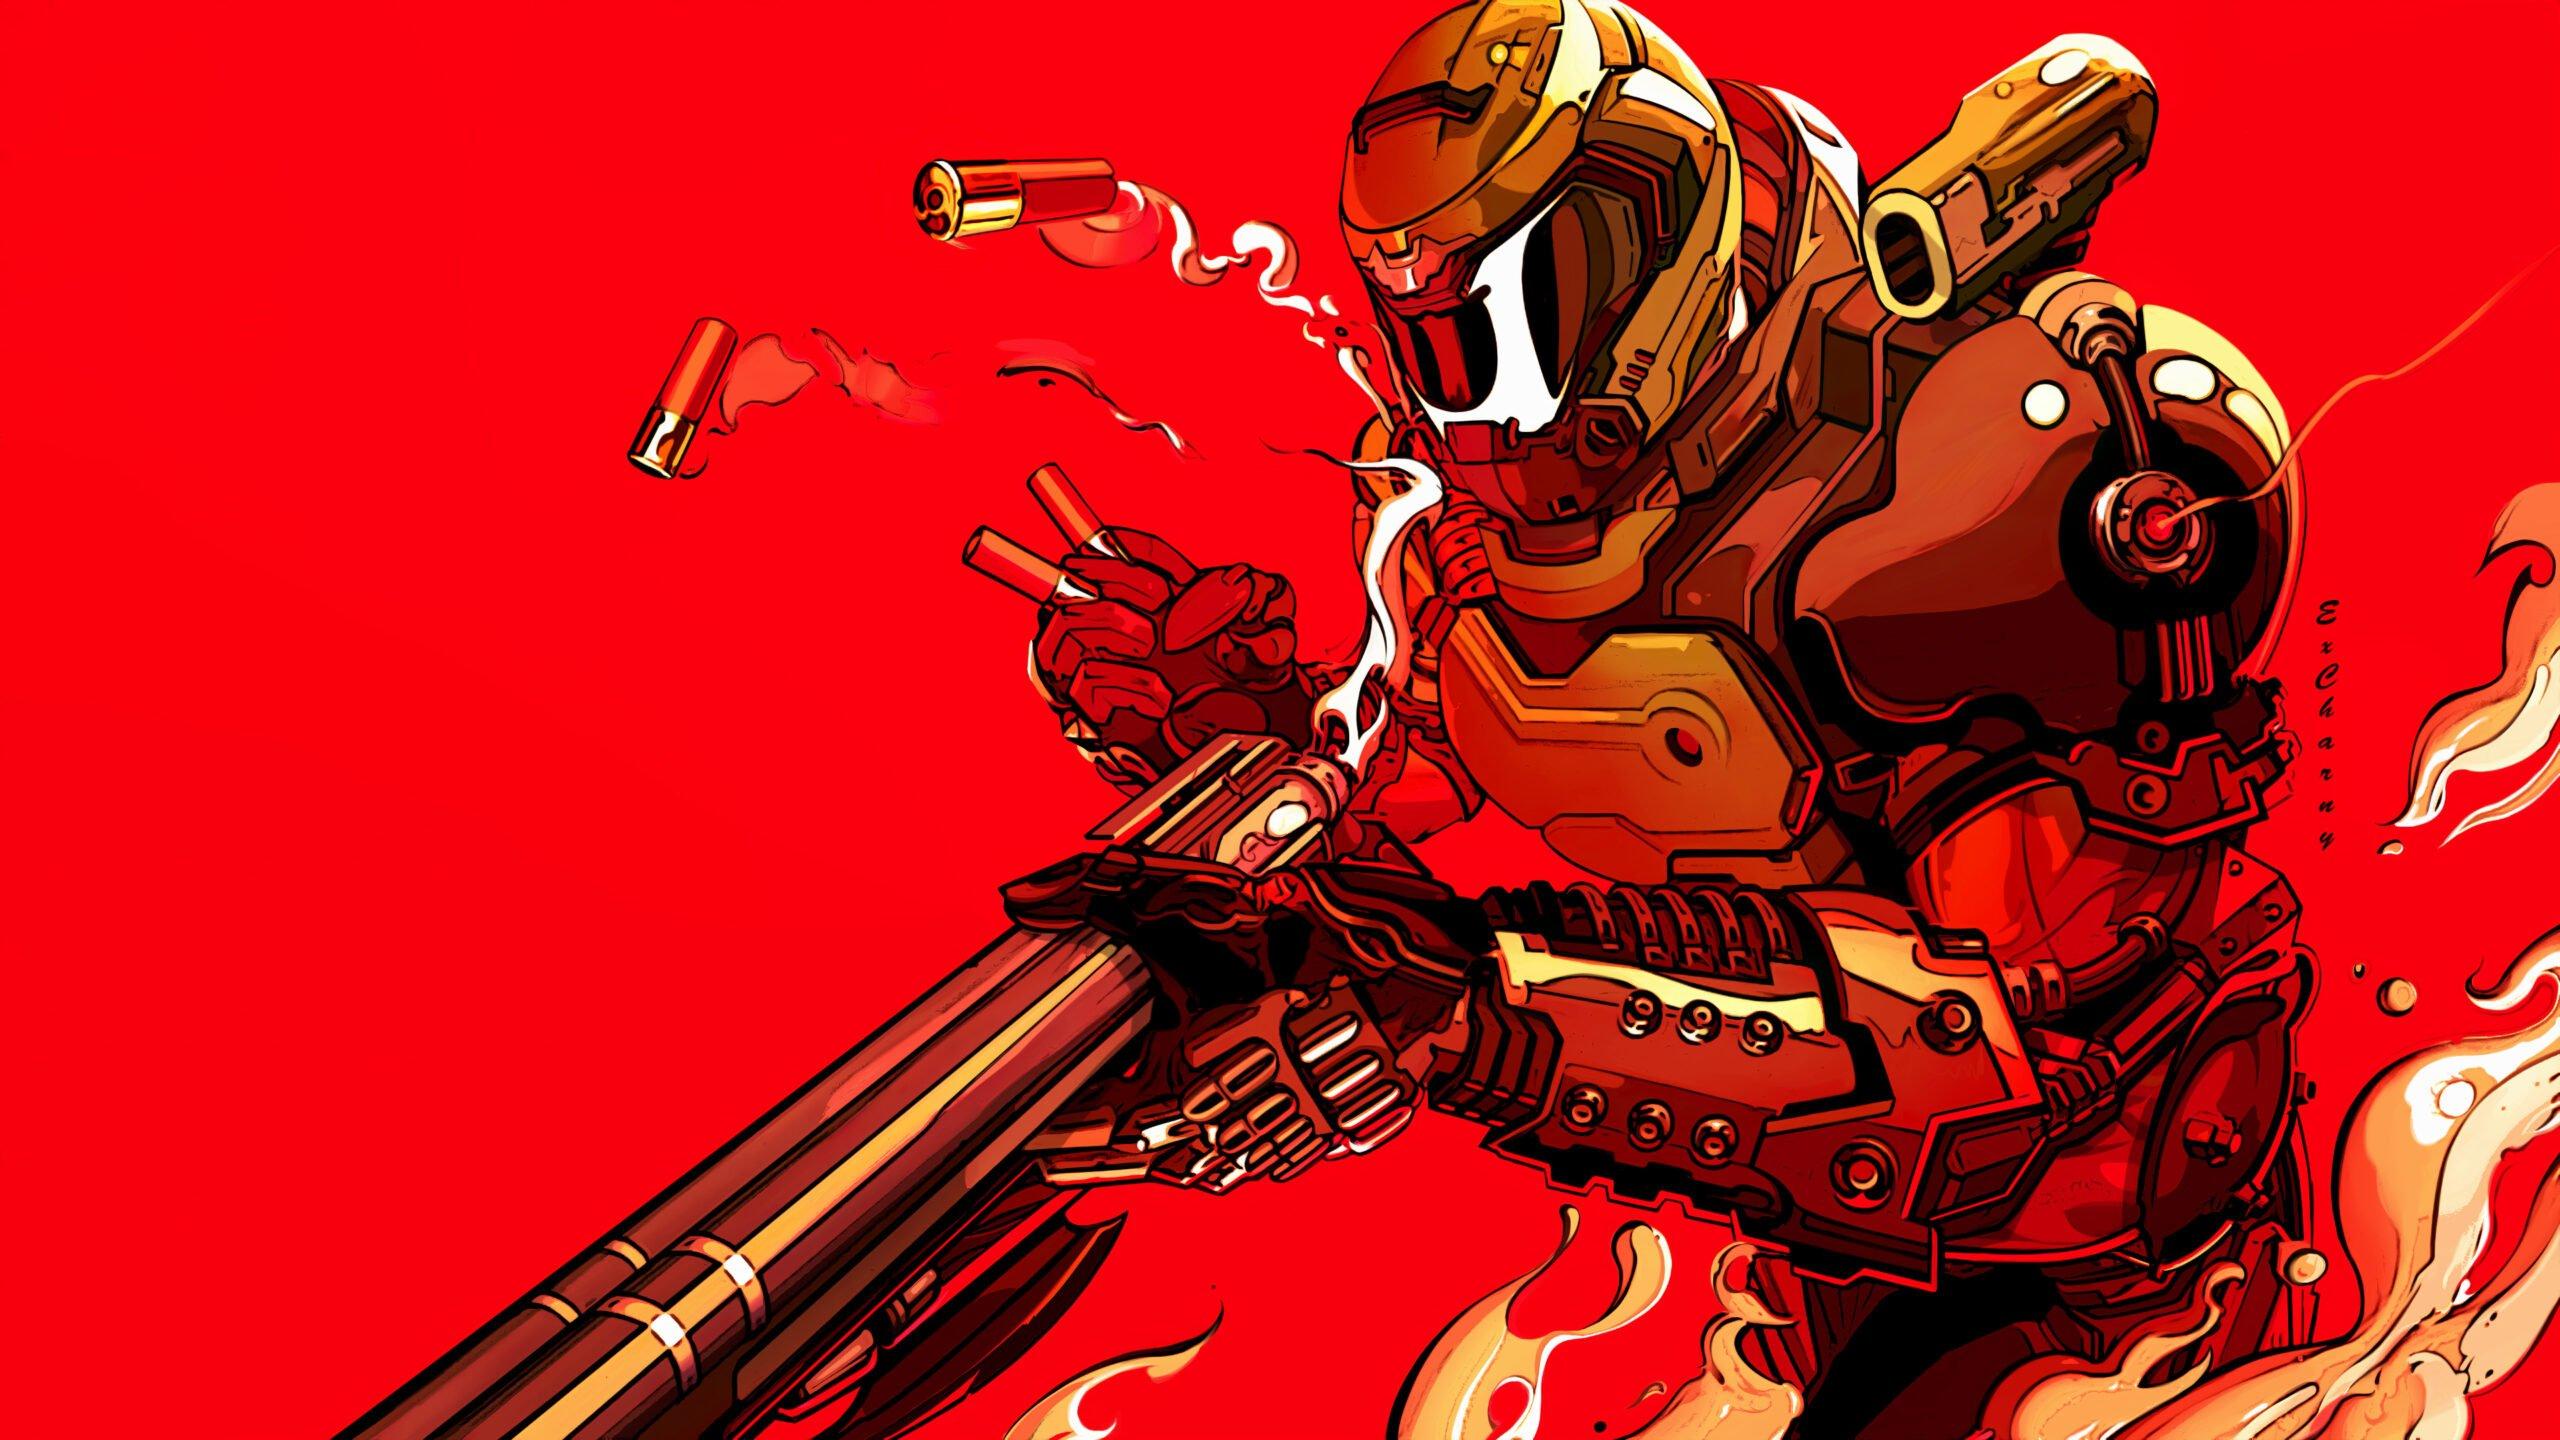 Doom ya funciona hasta en un test de embarazo